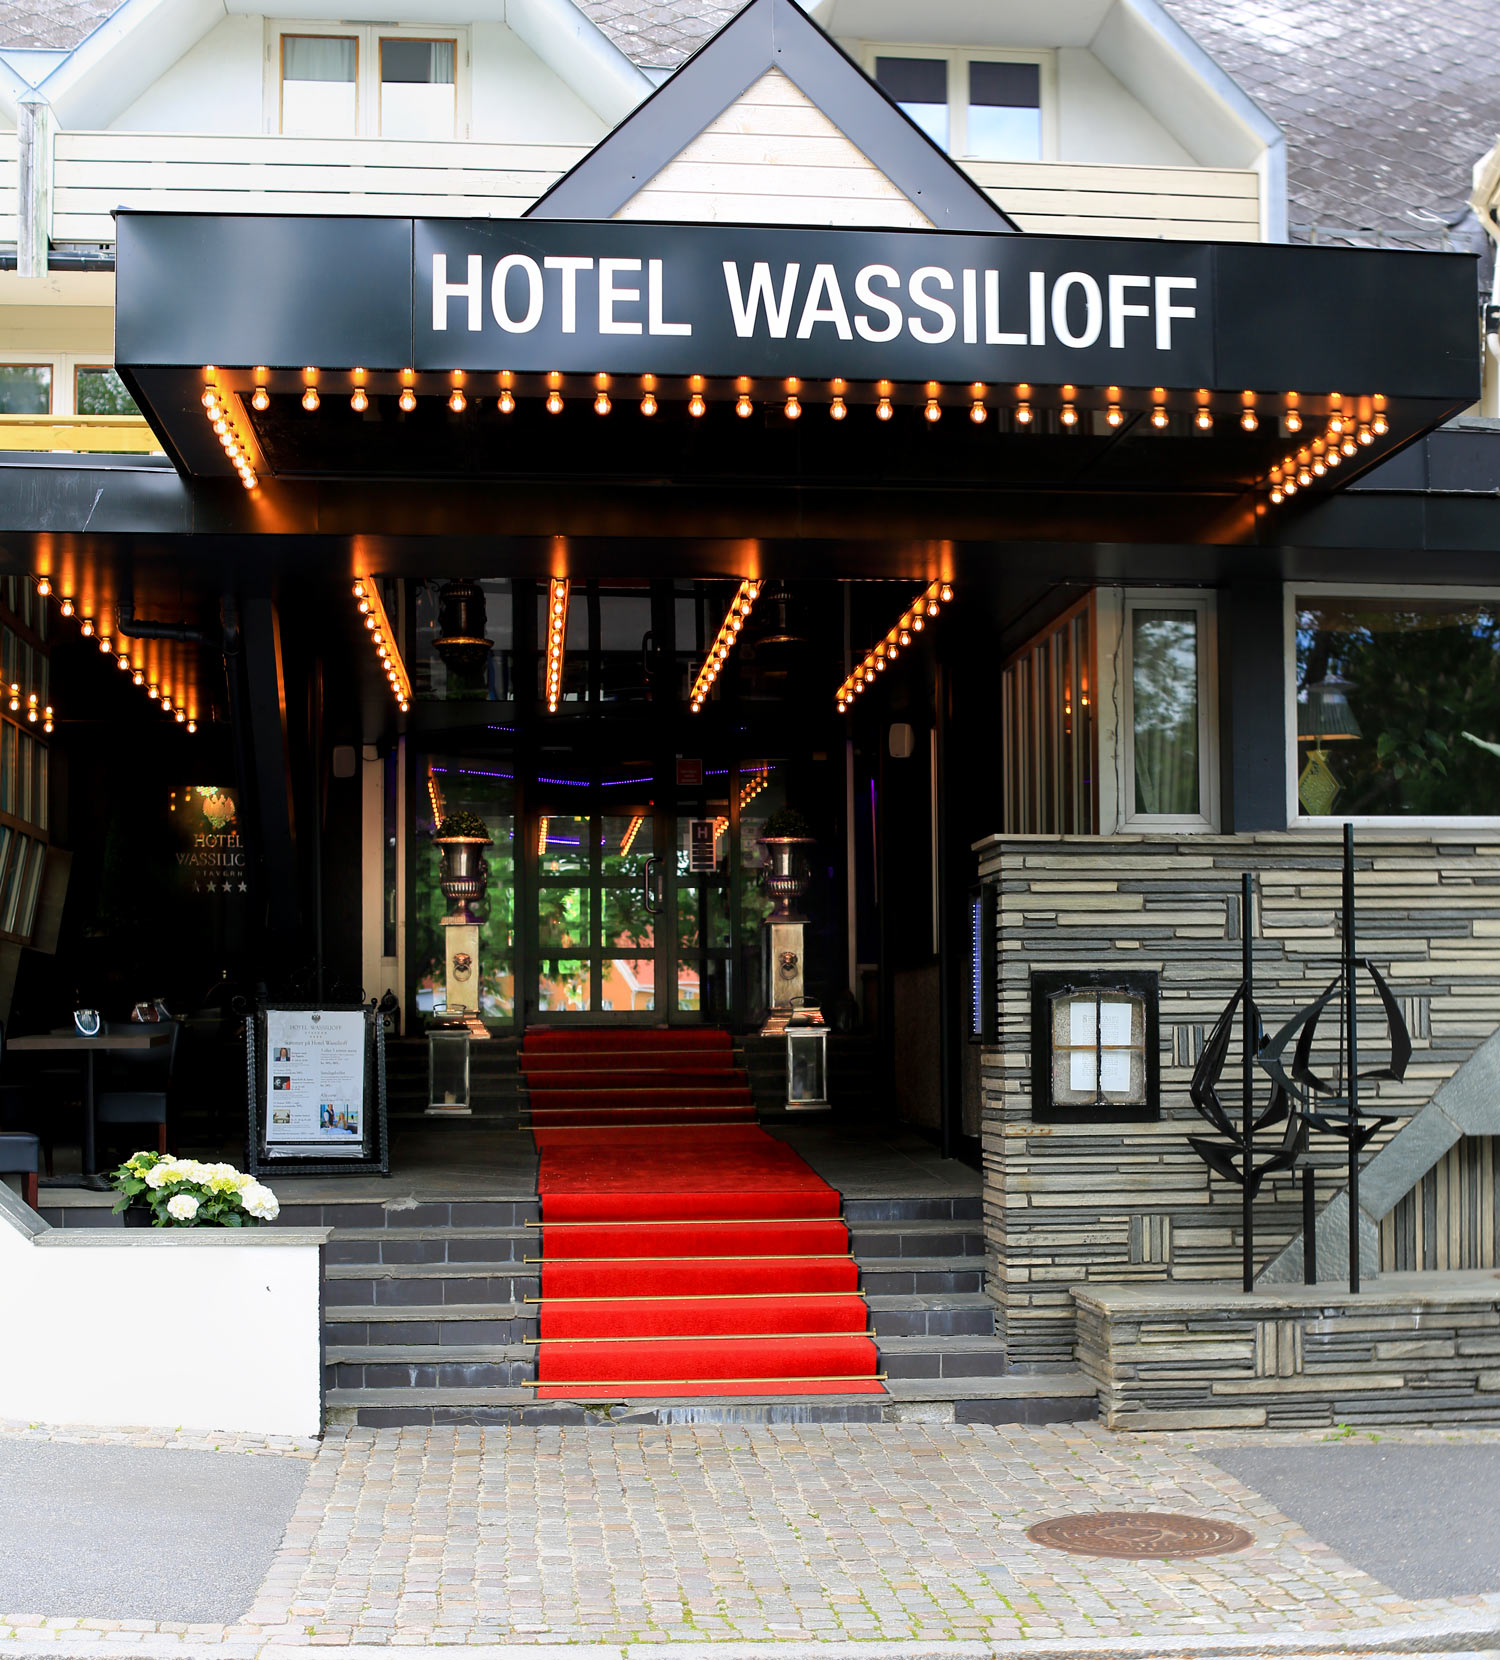 wassilioff-kkhinngang-Untitled_Panorama1.jpg